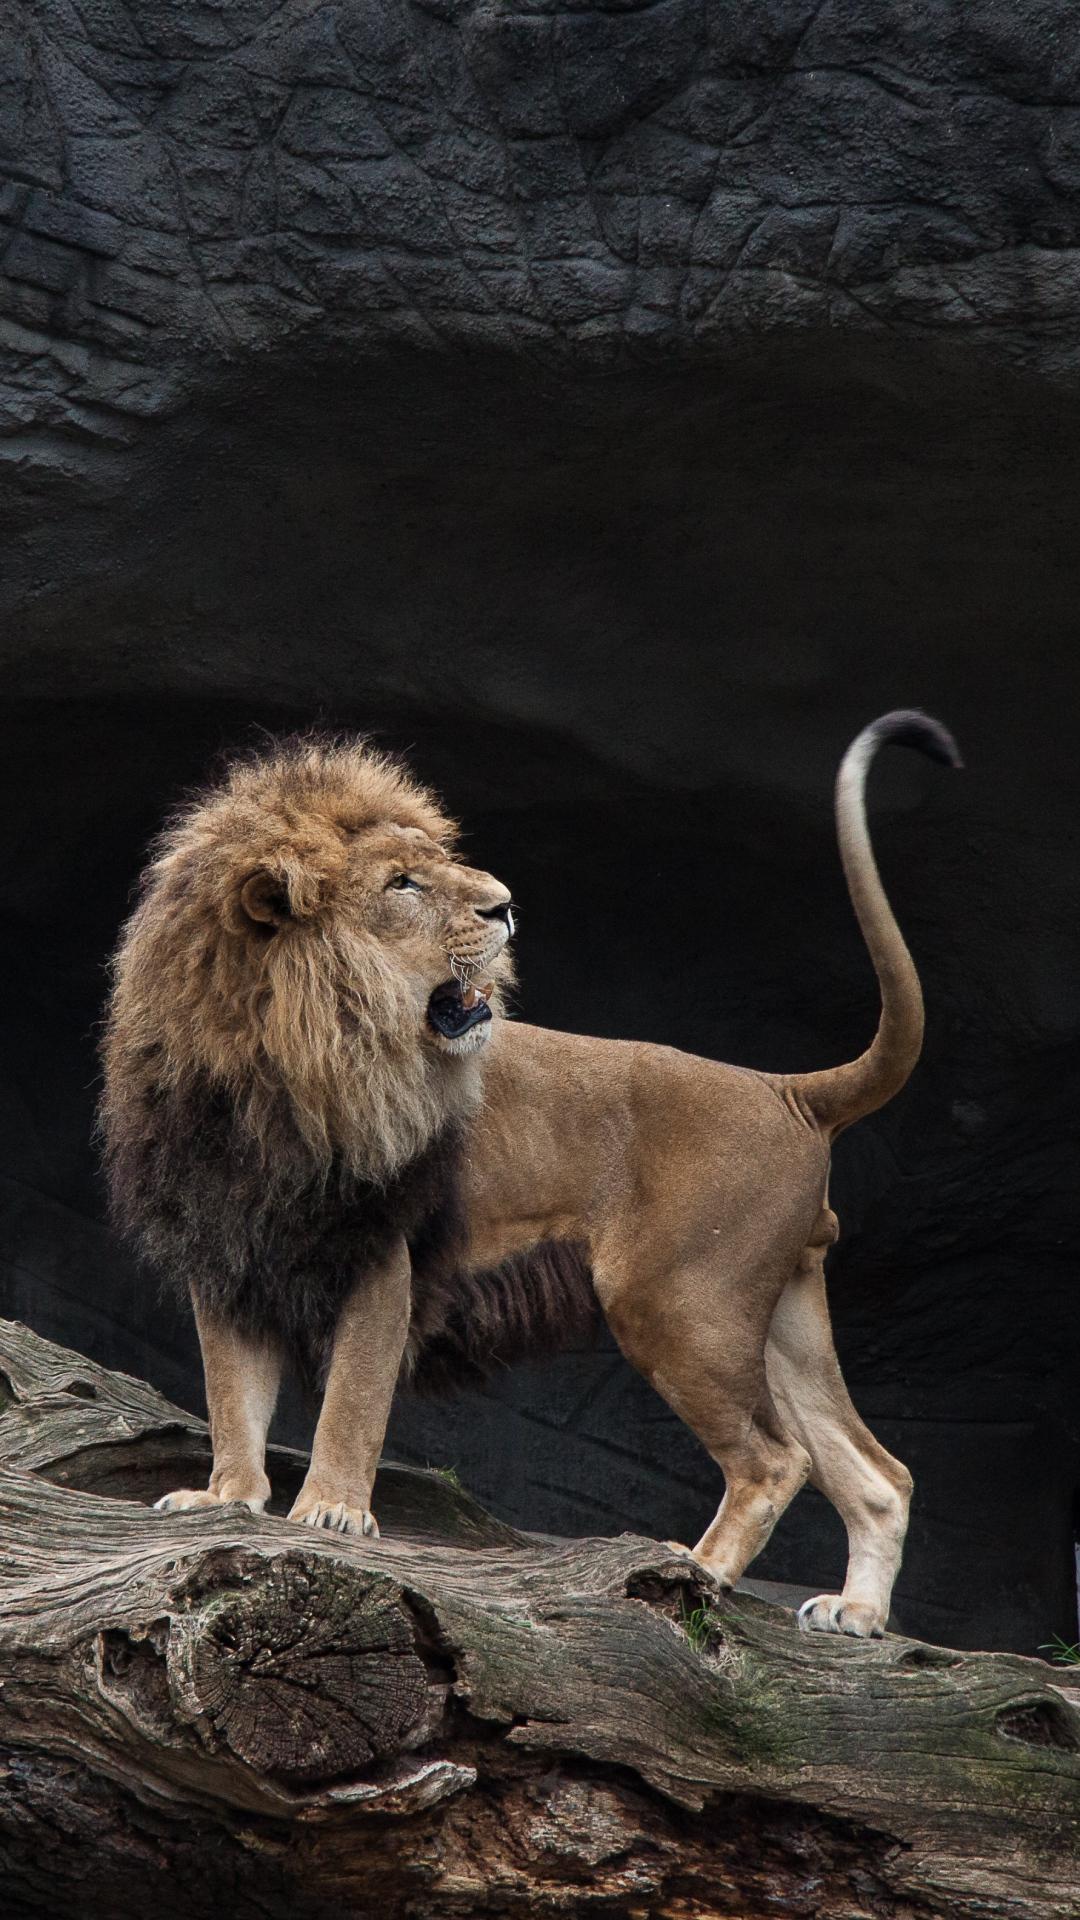 iphone wallpaper lion predator Lion